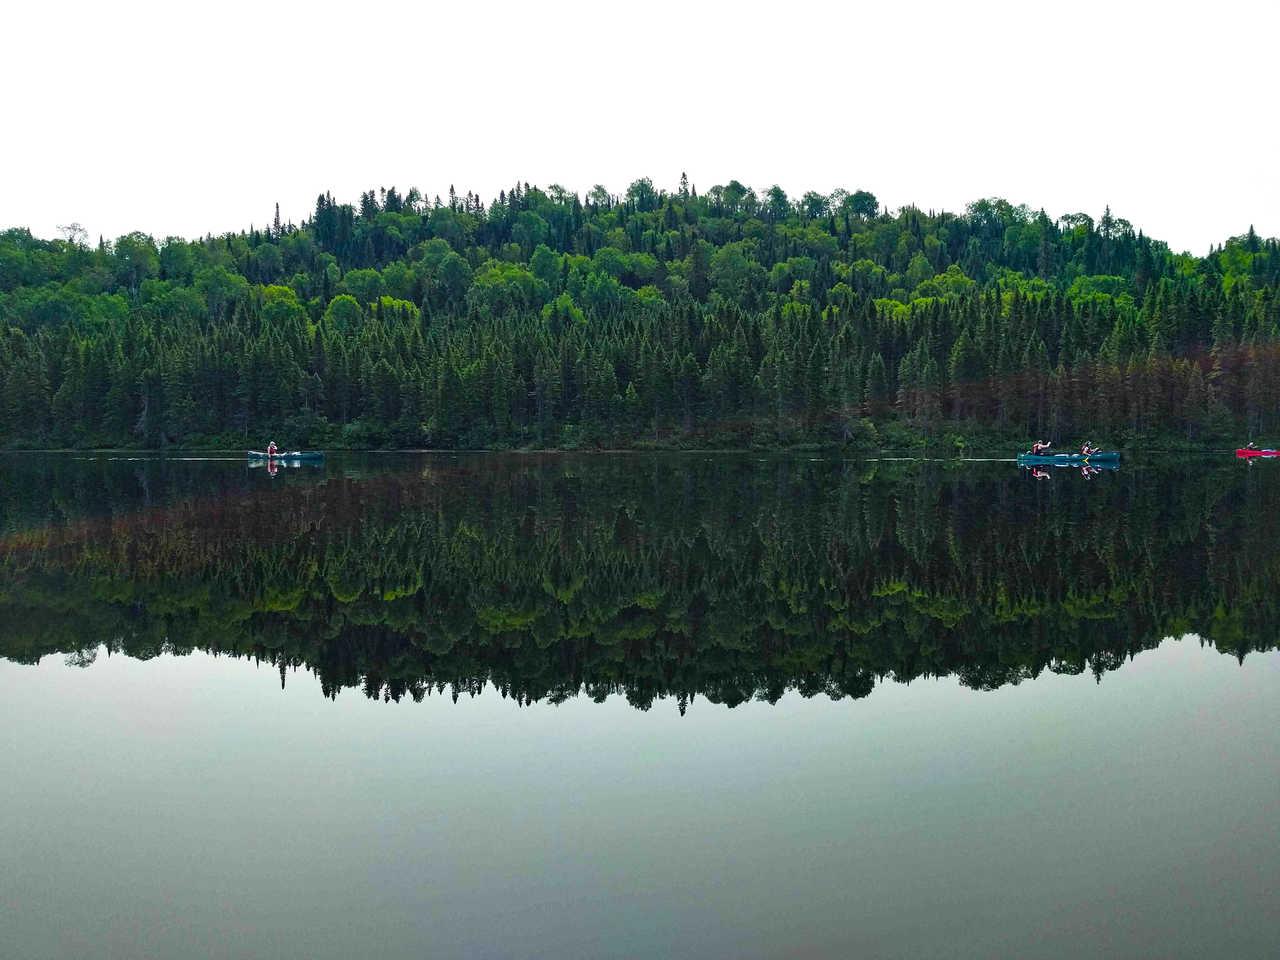 Canoë sur les rivières du Canada, Québec